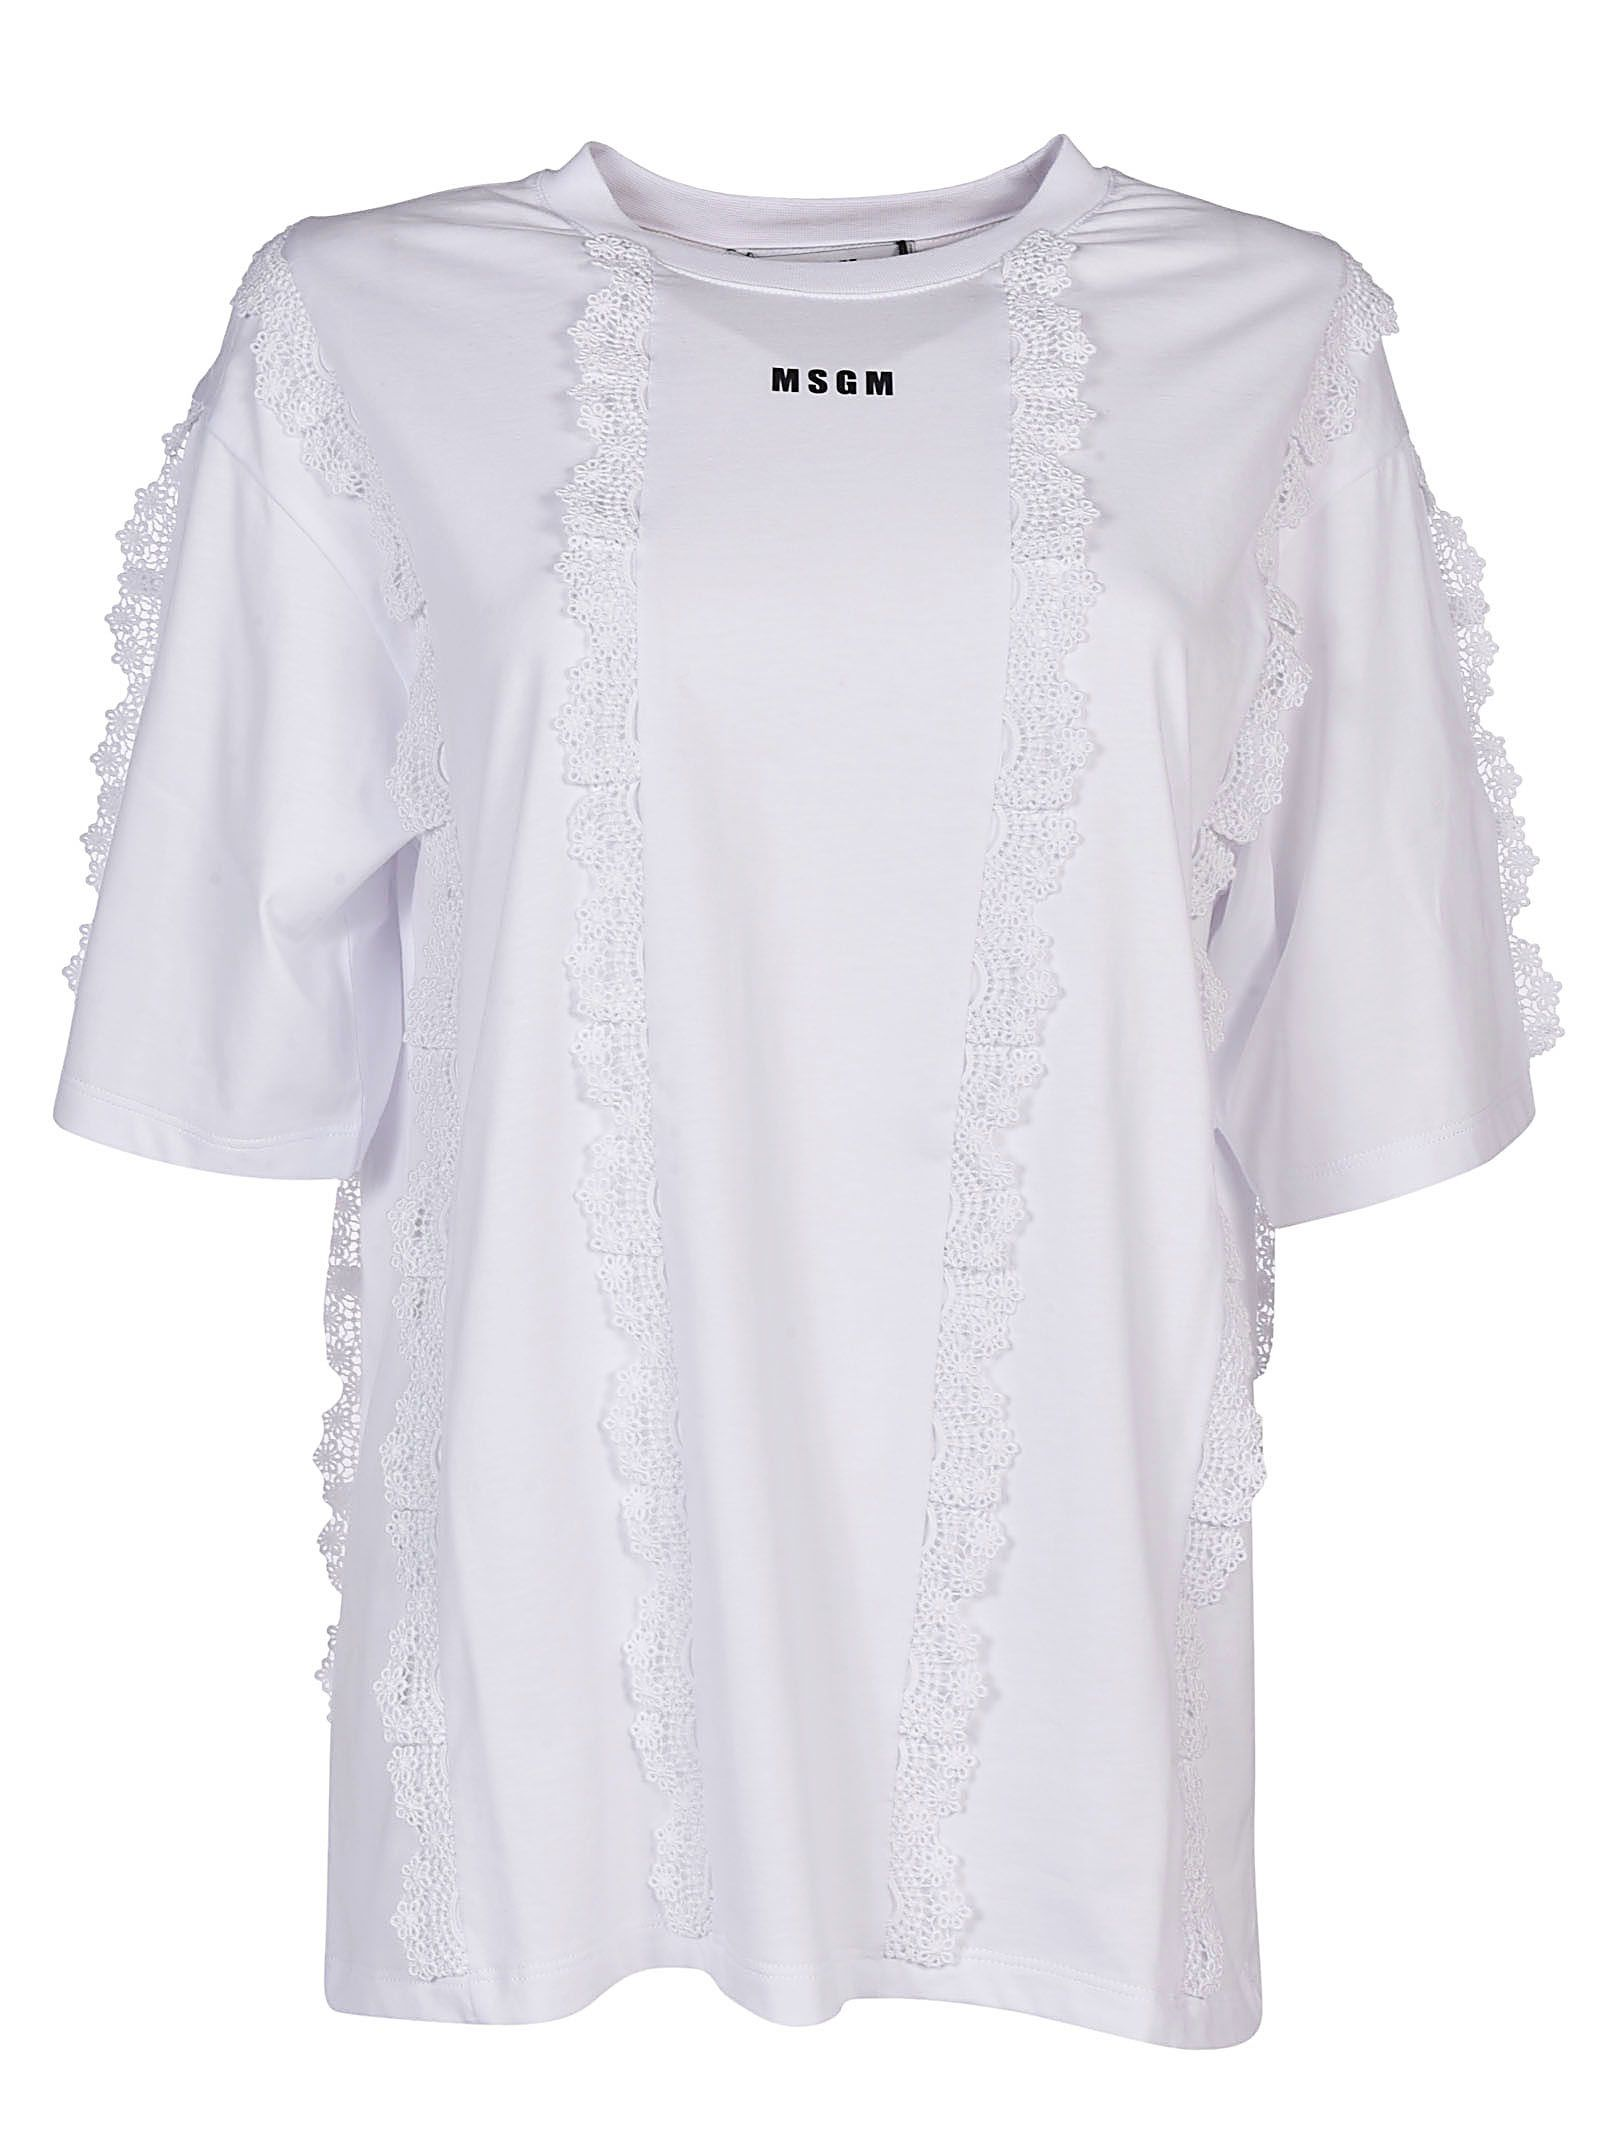 Msgm Lace Trim T-shirt